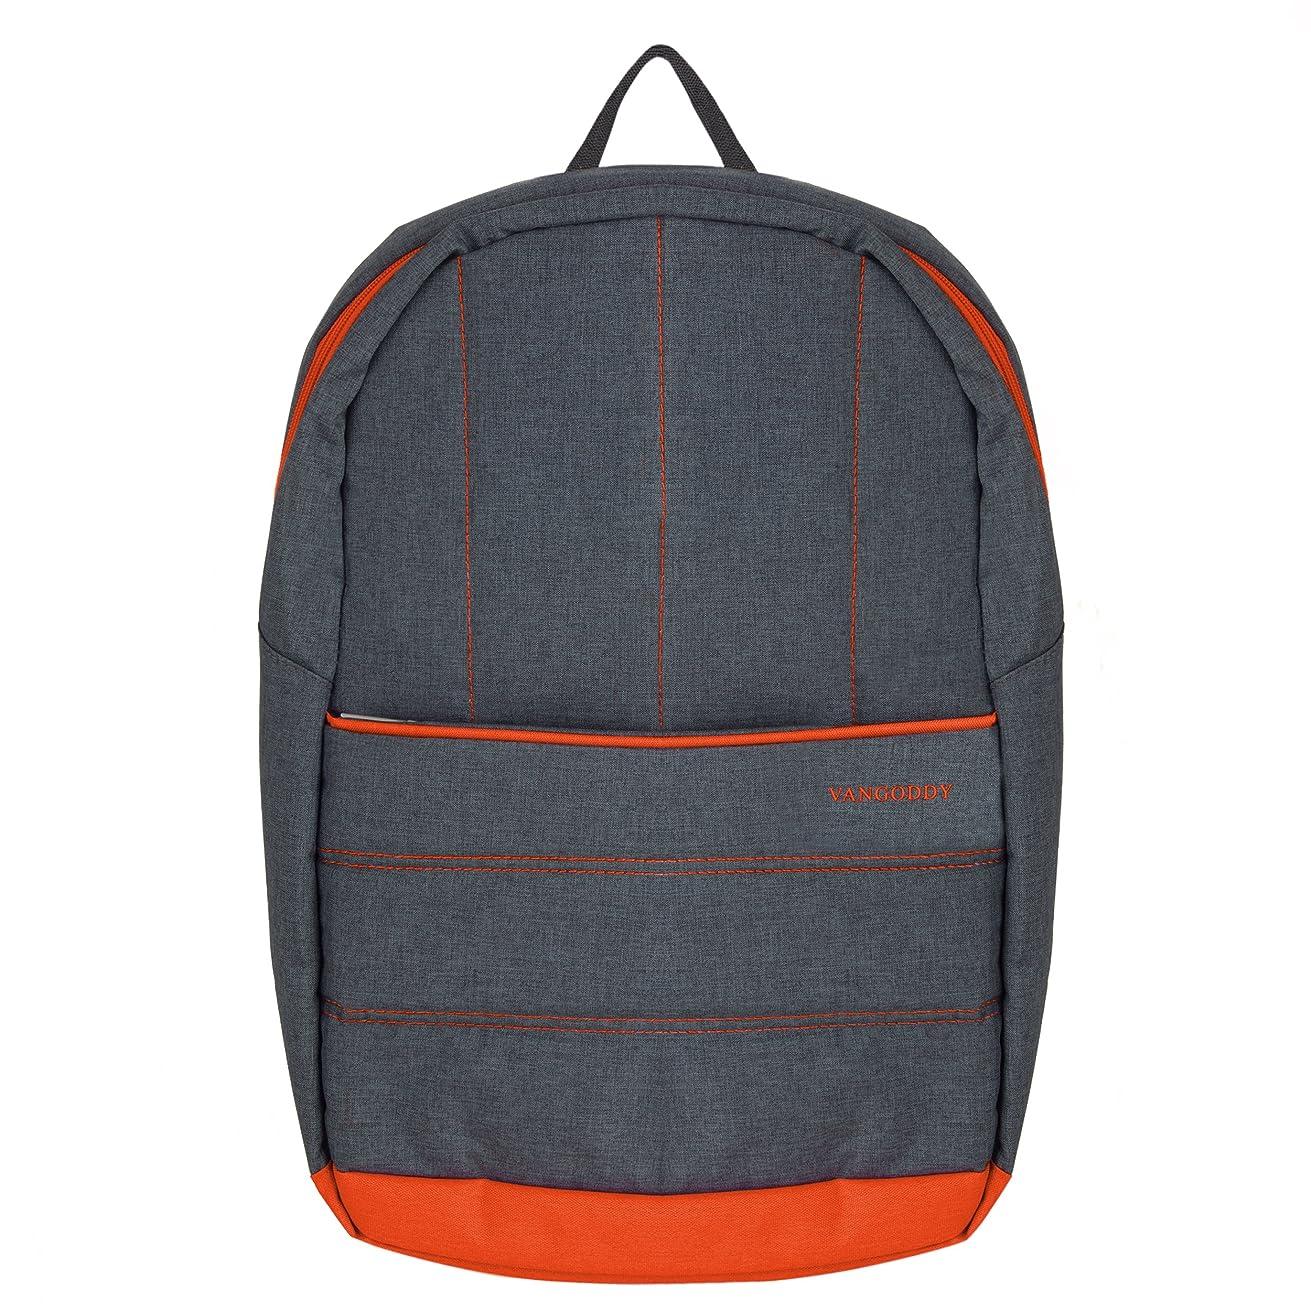 VanGoddy Grove Backpack for Acer 13.3 to 15.6 inch Laptops (Orange)